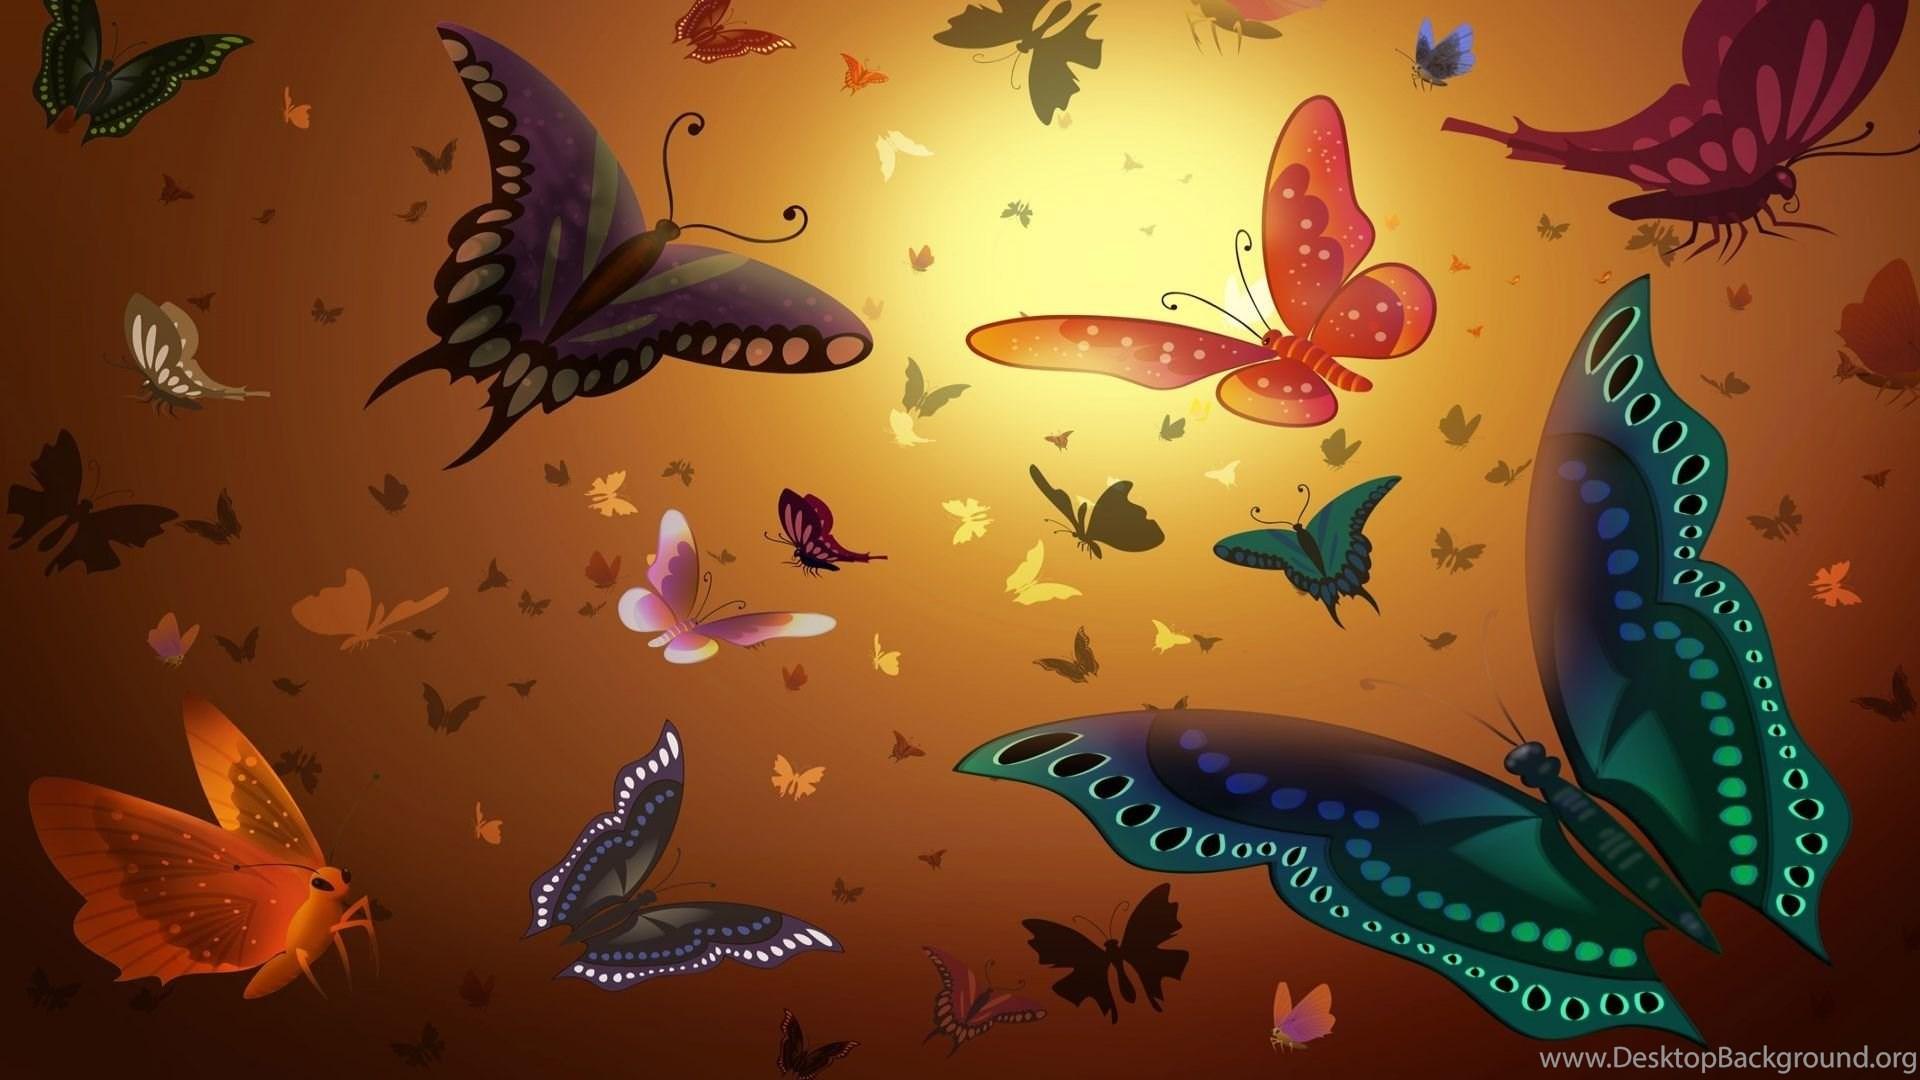 Hd Wallpaper Artistic Wallpapers Desktop Background